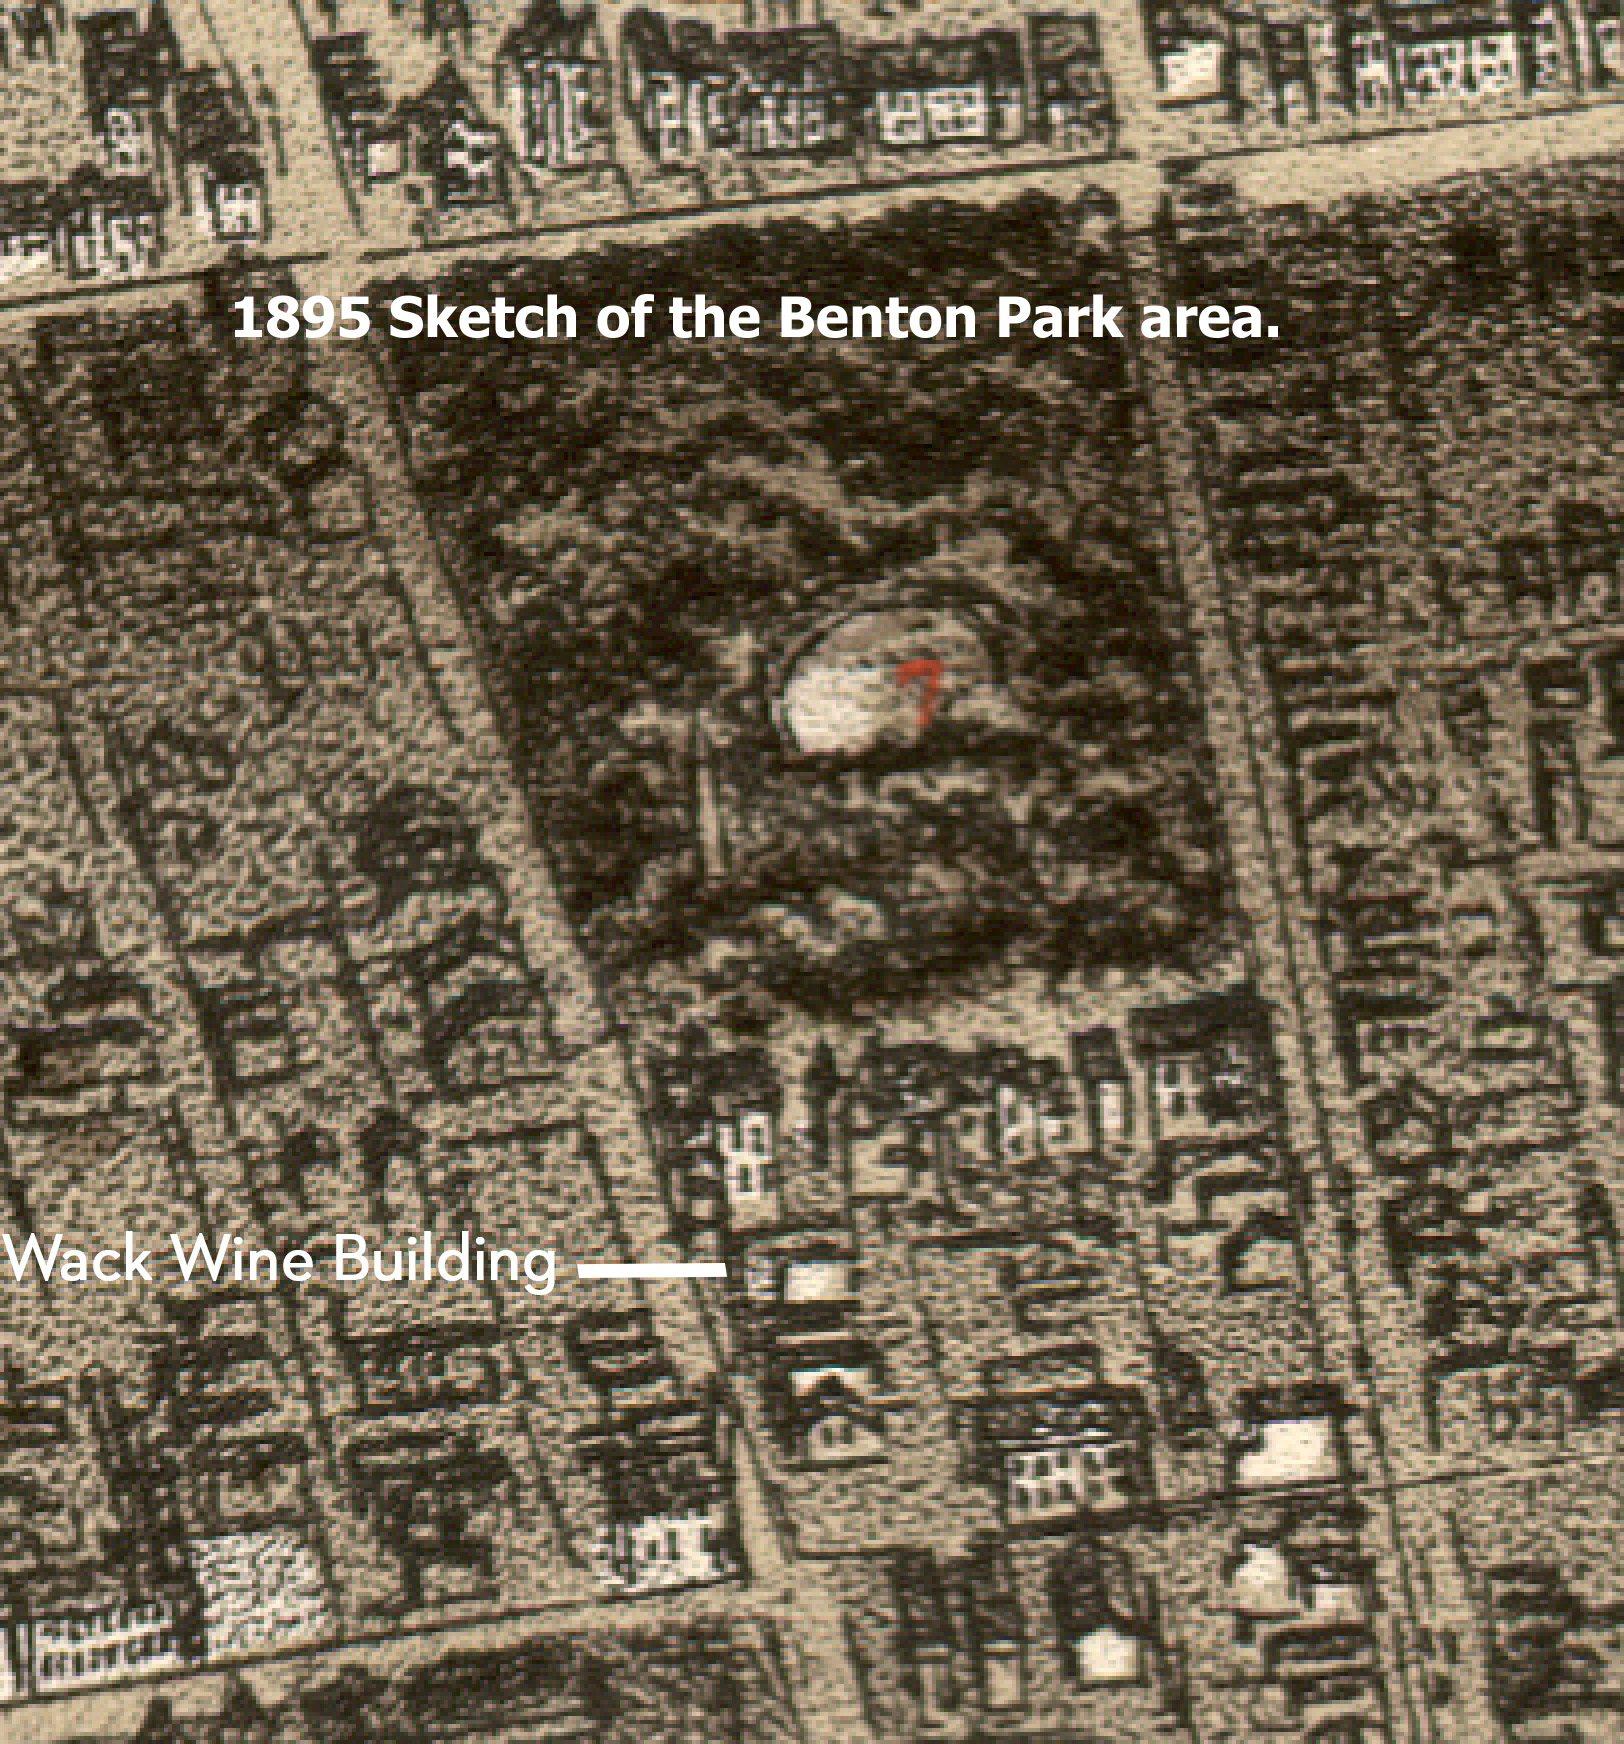 Benton Park 1895 with text.jpg